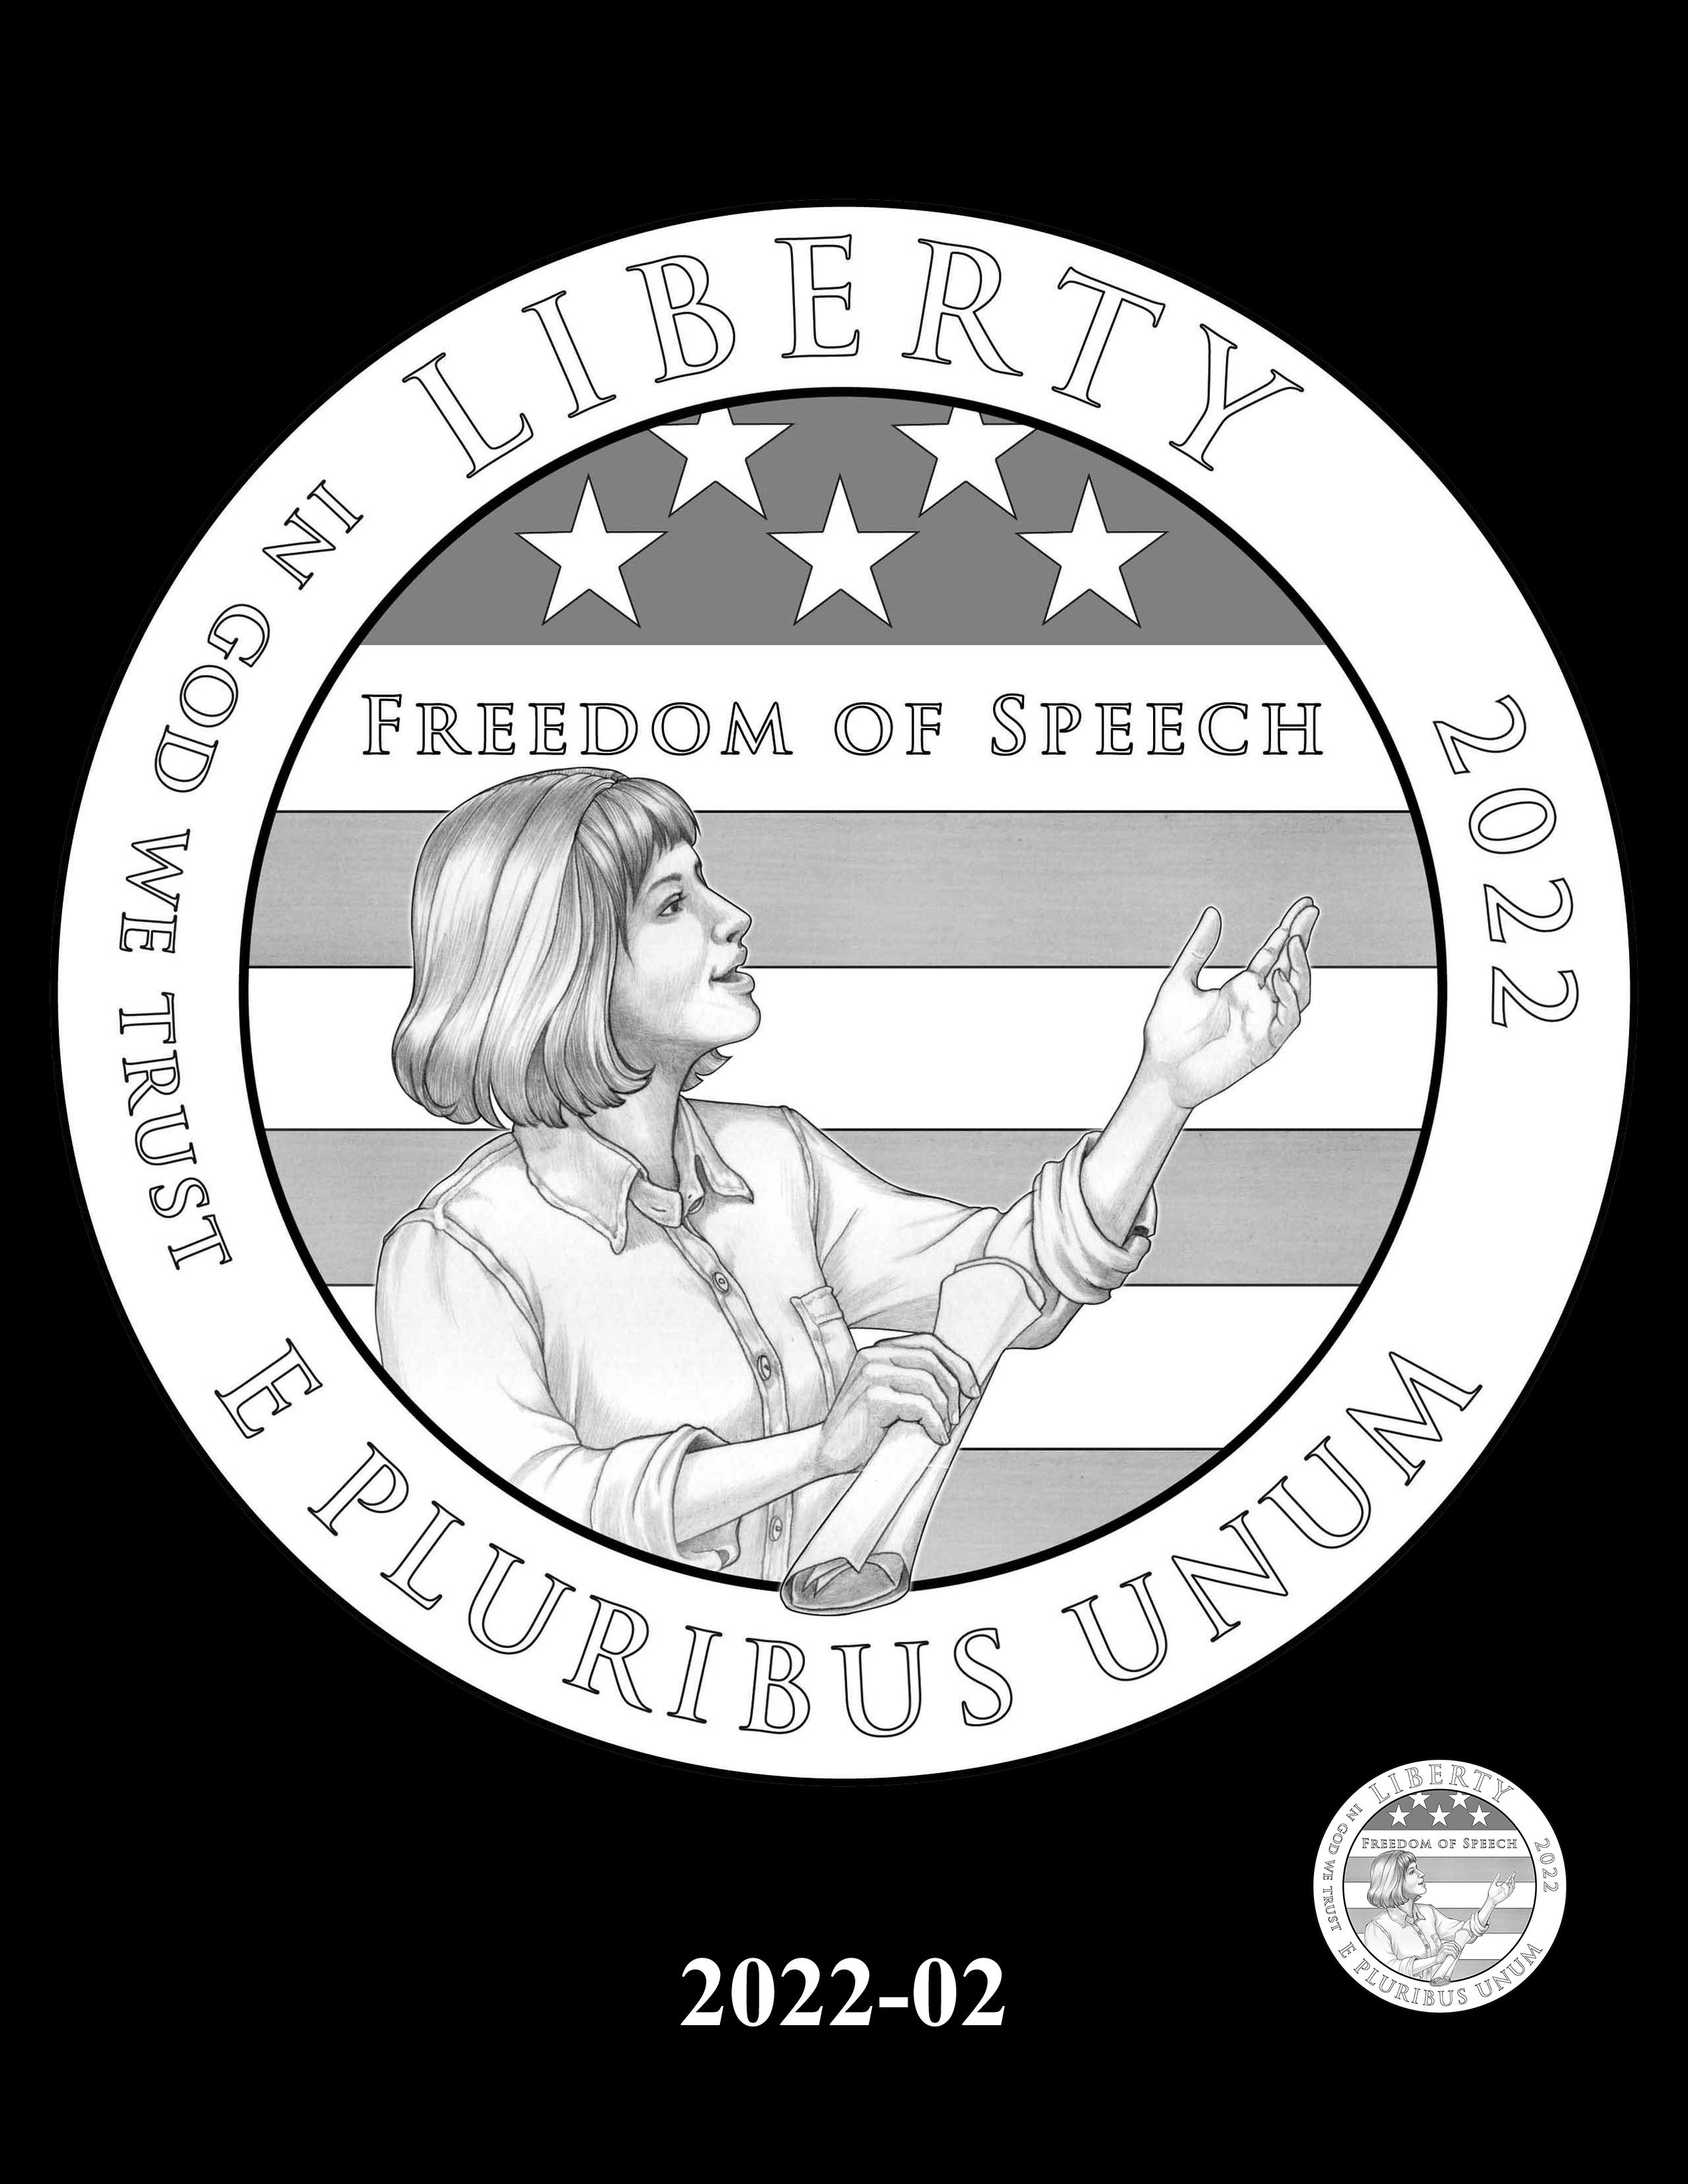 02-2022 -- 2021 - 2025 American Eagle Platinum Proof Program